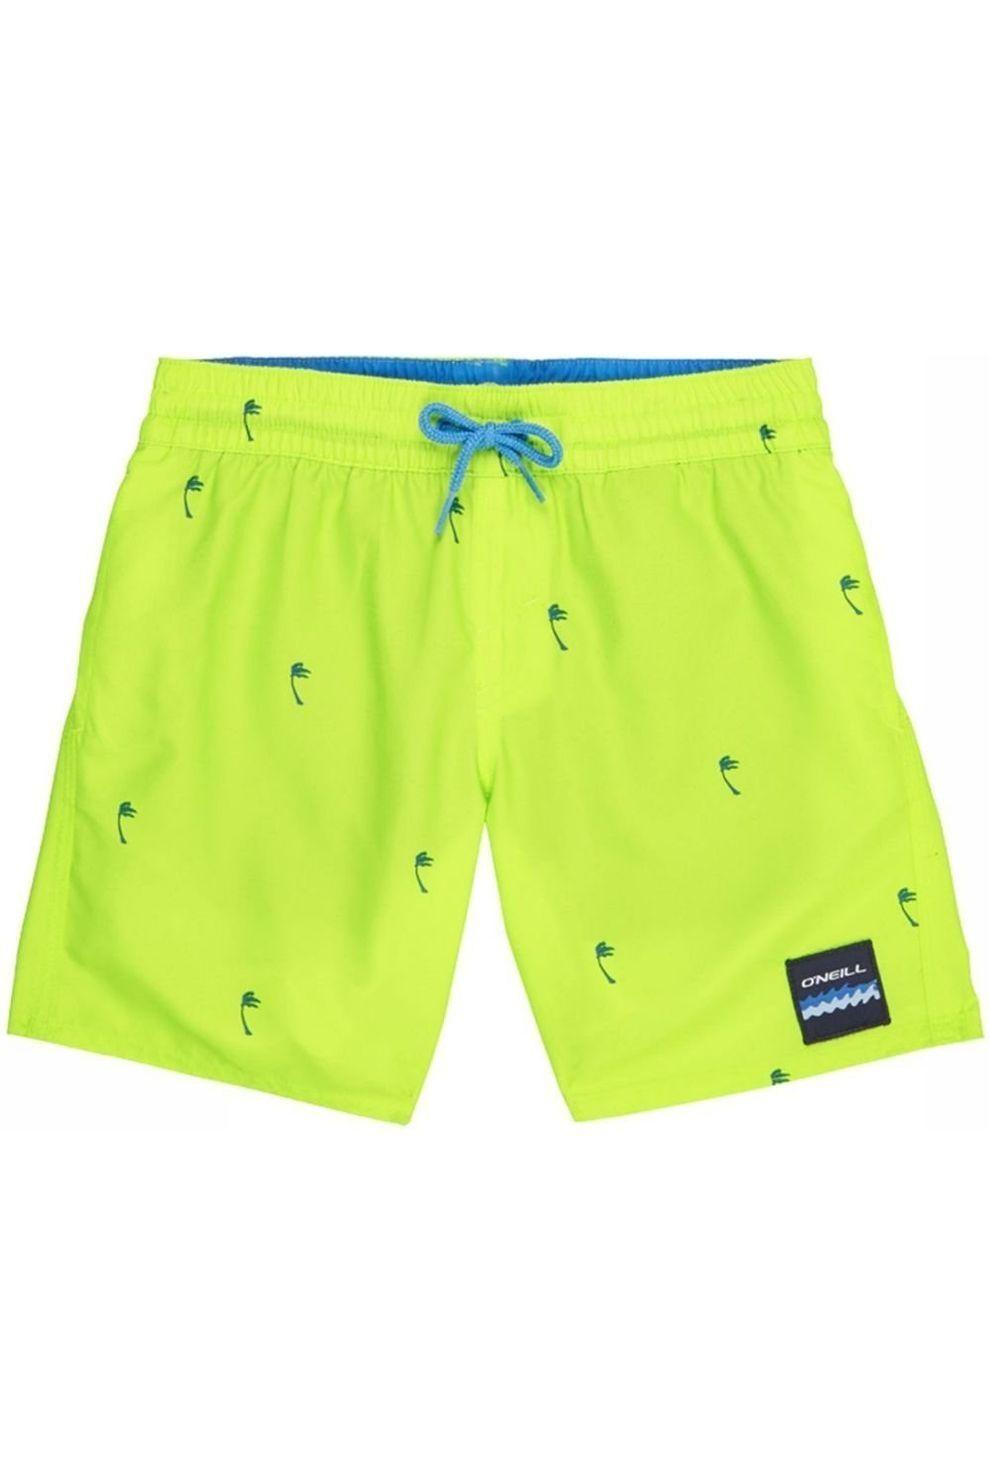 O'Neill Zwemshort Pb Mini Palms voor jongens - Limoen Groen/ Gemengd - Maat: 140